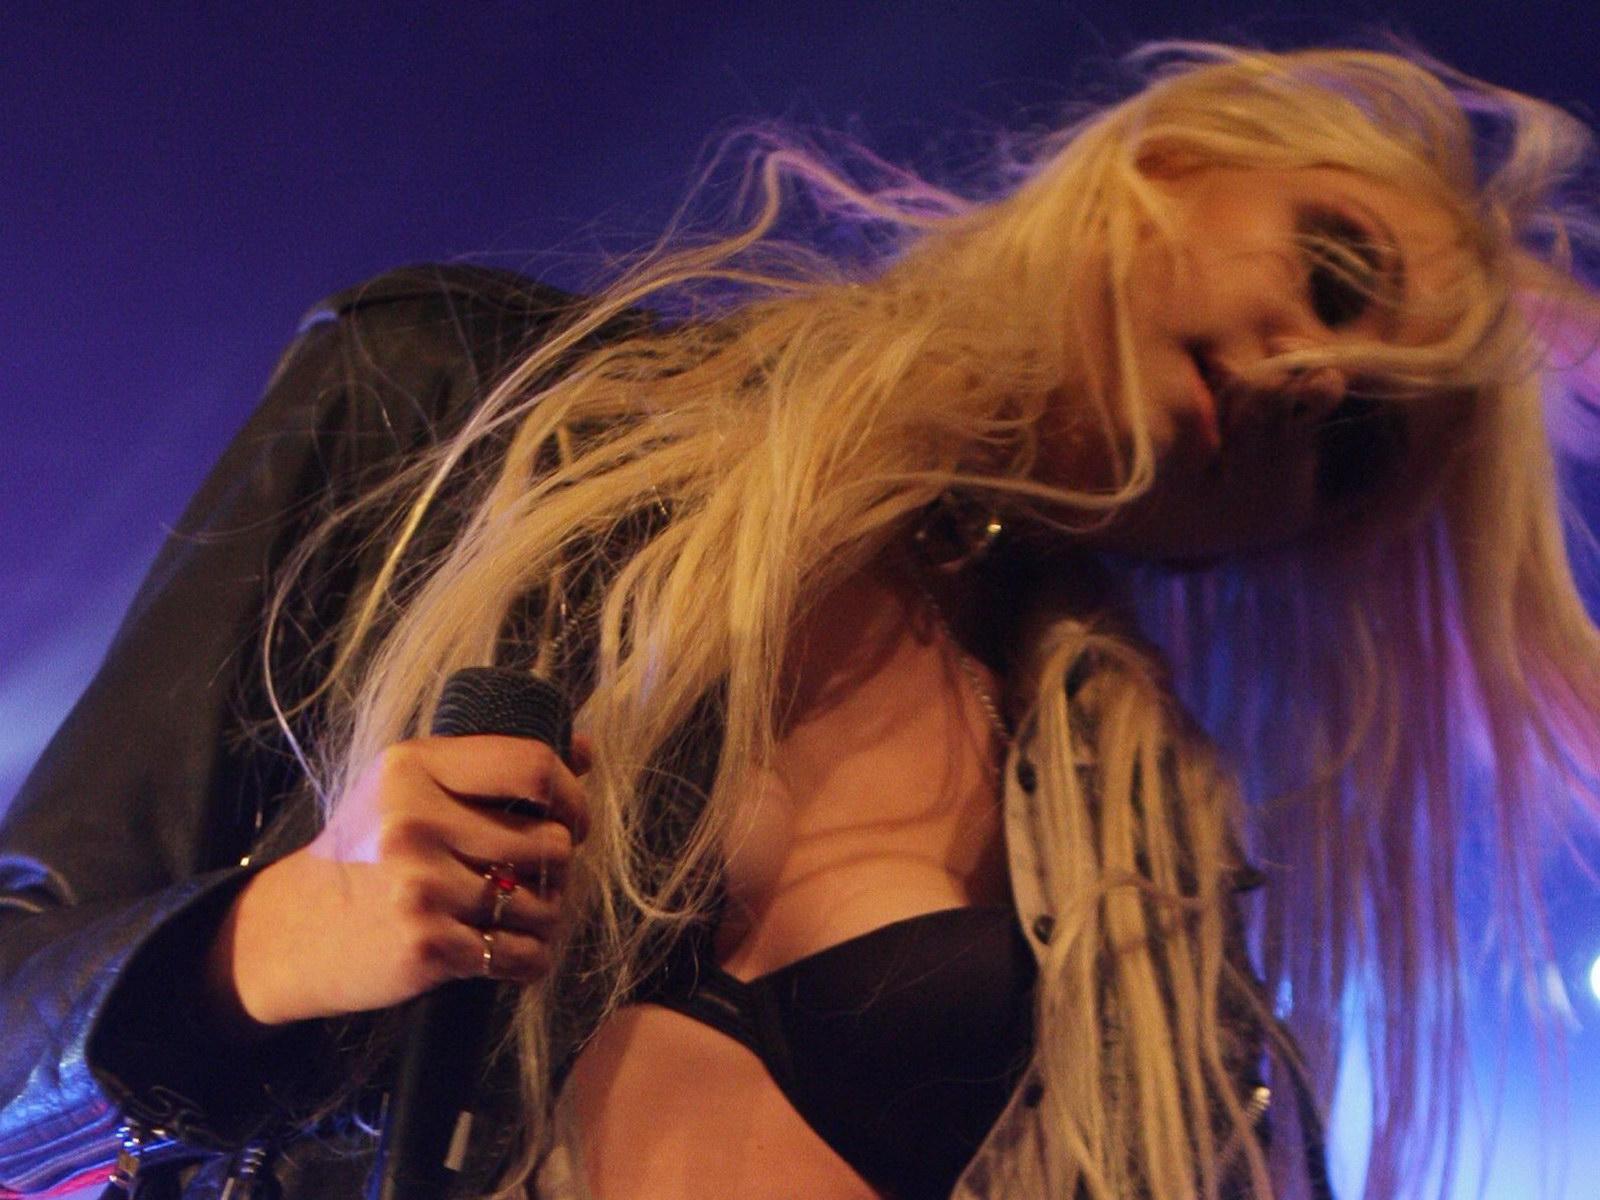 http://1.bp.blogspot.com/_NRGPIrDtEg8/TQsvq8IbQvI/AAAAAAAAAbA/Ir7KY50jVsU/s1600/Taylor_Momsen_cleavage_1.jpg